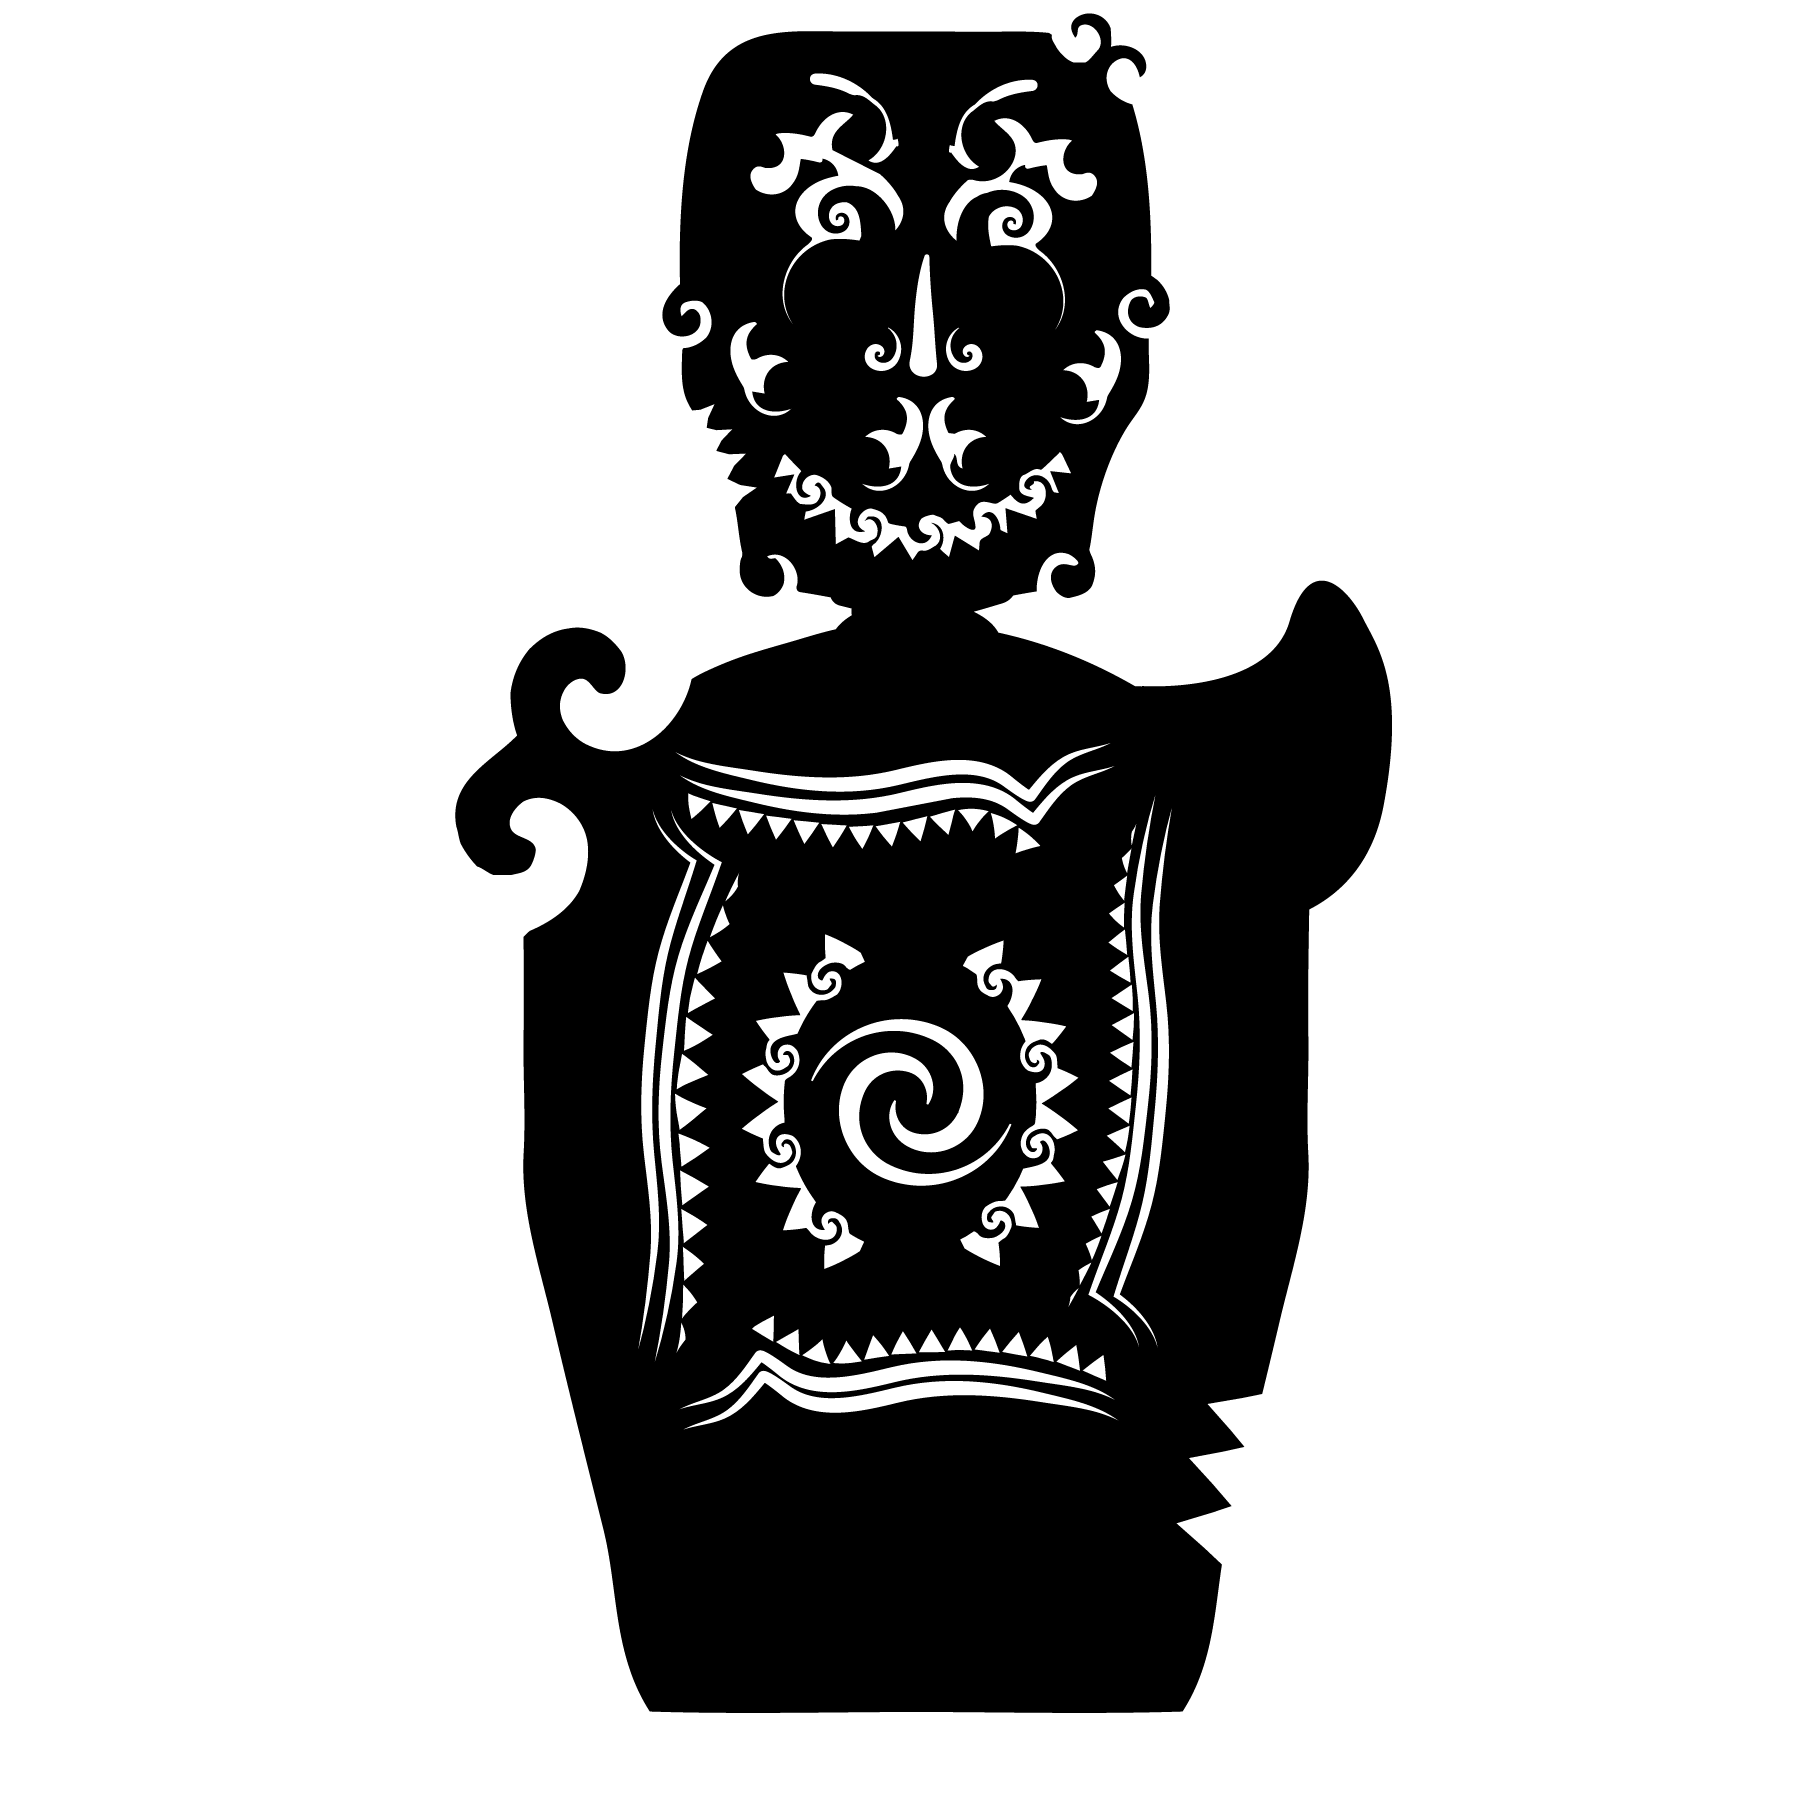 Basic Symbols-16.png